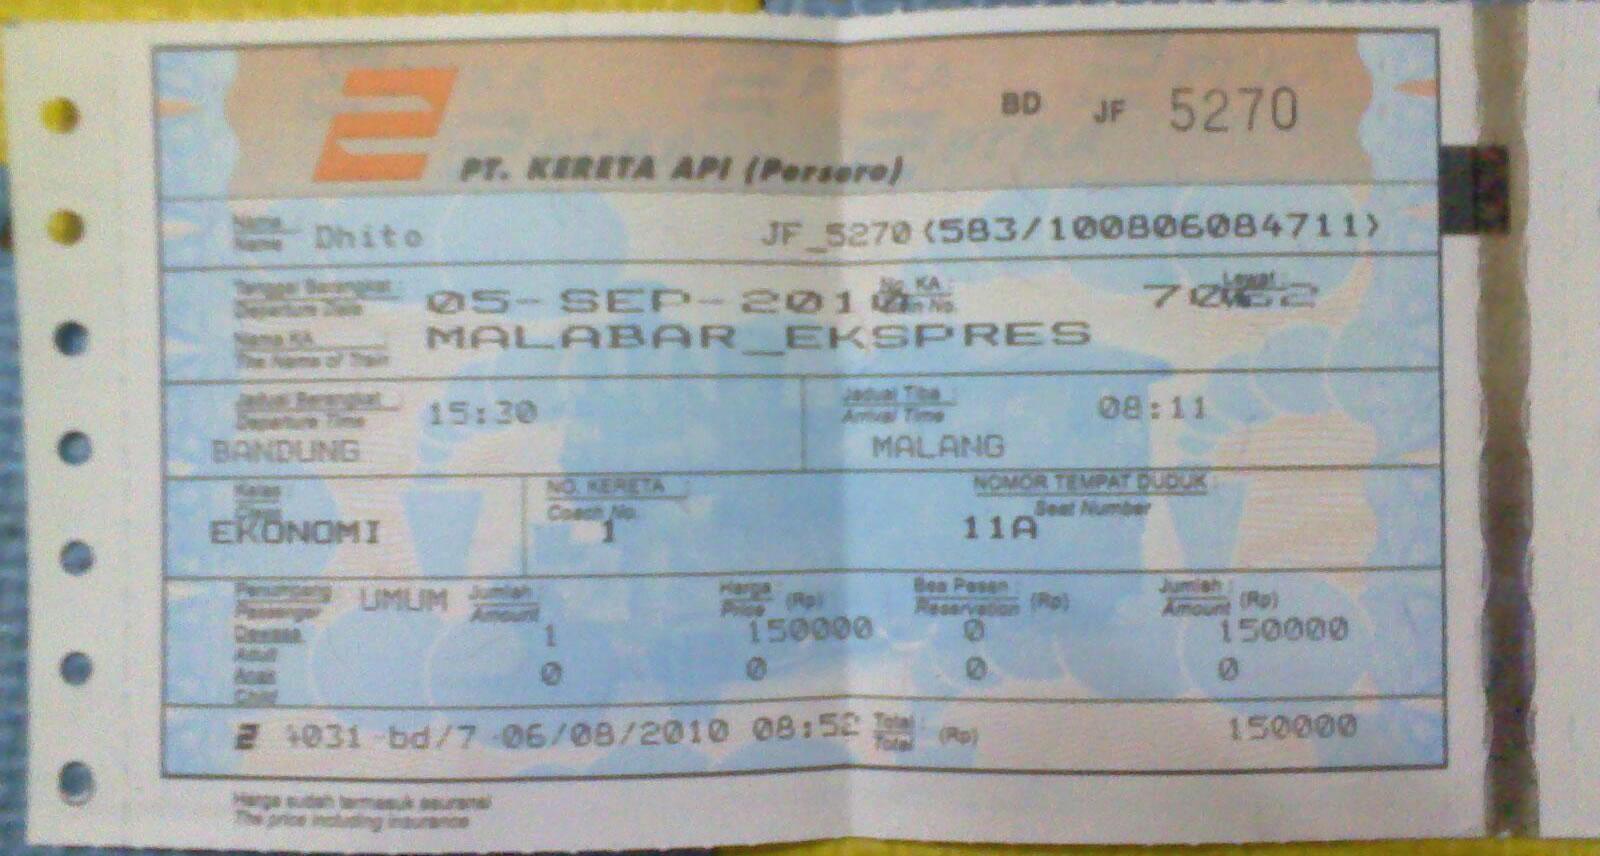 Tiket Kereta Api Musafir Kehidupan